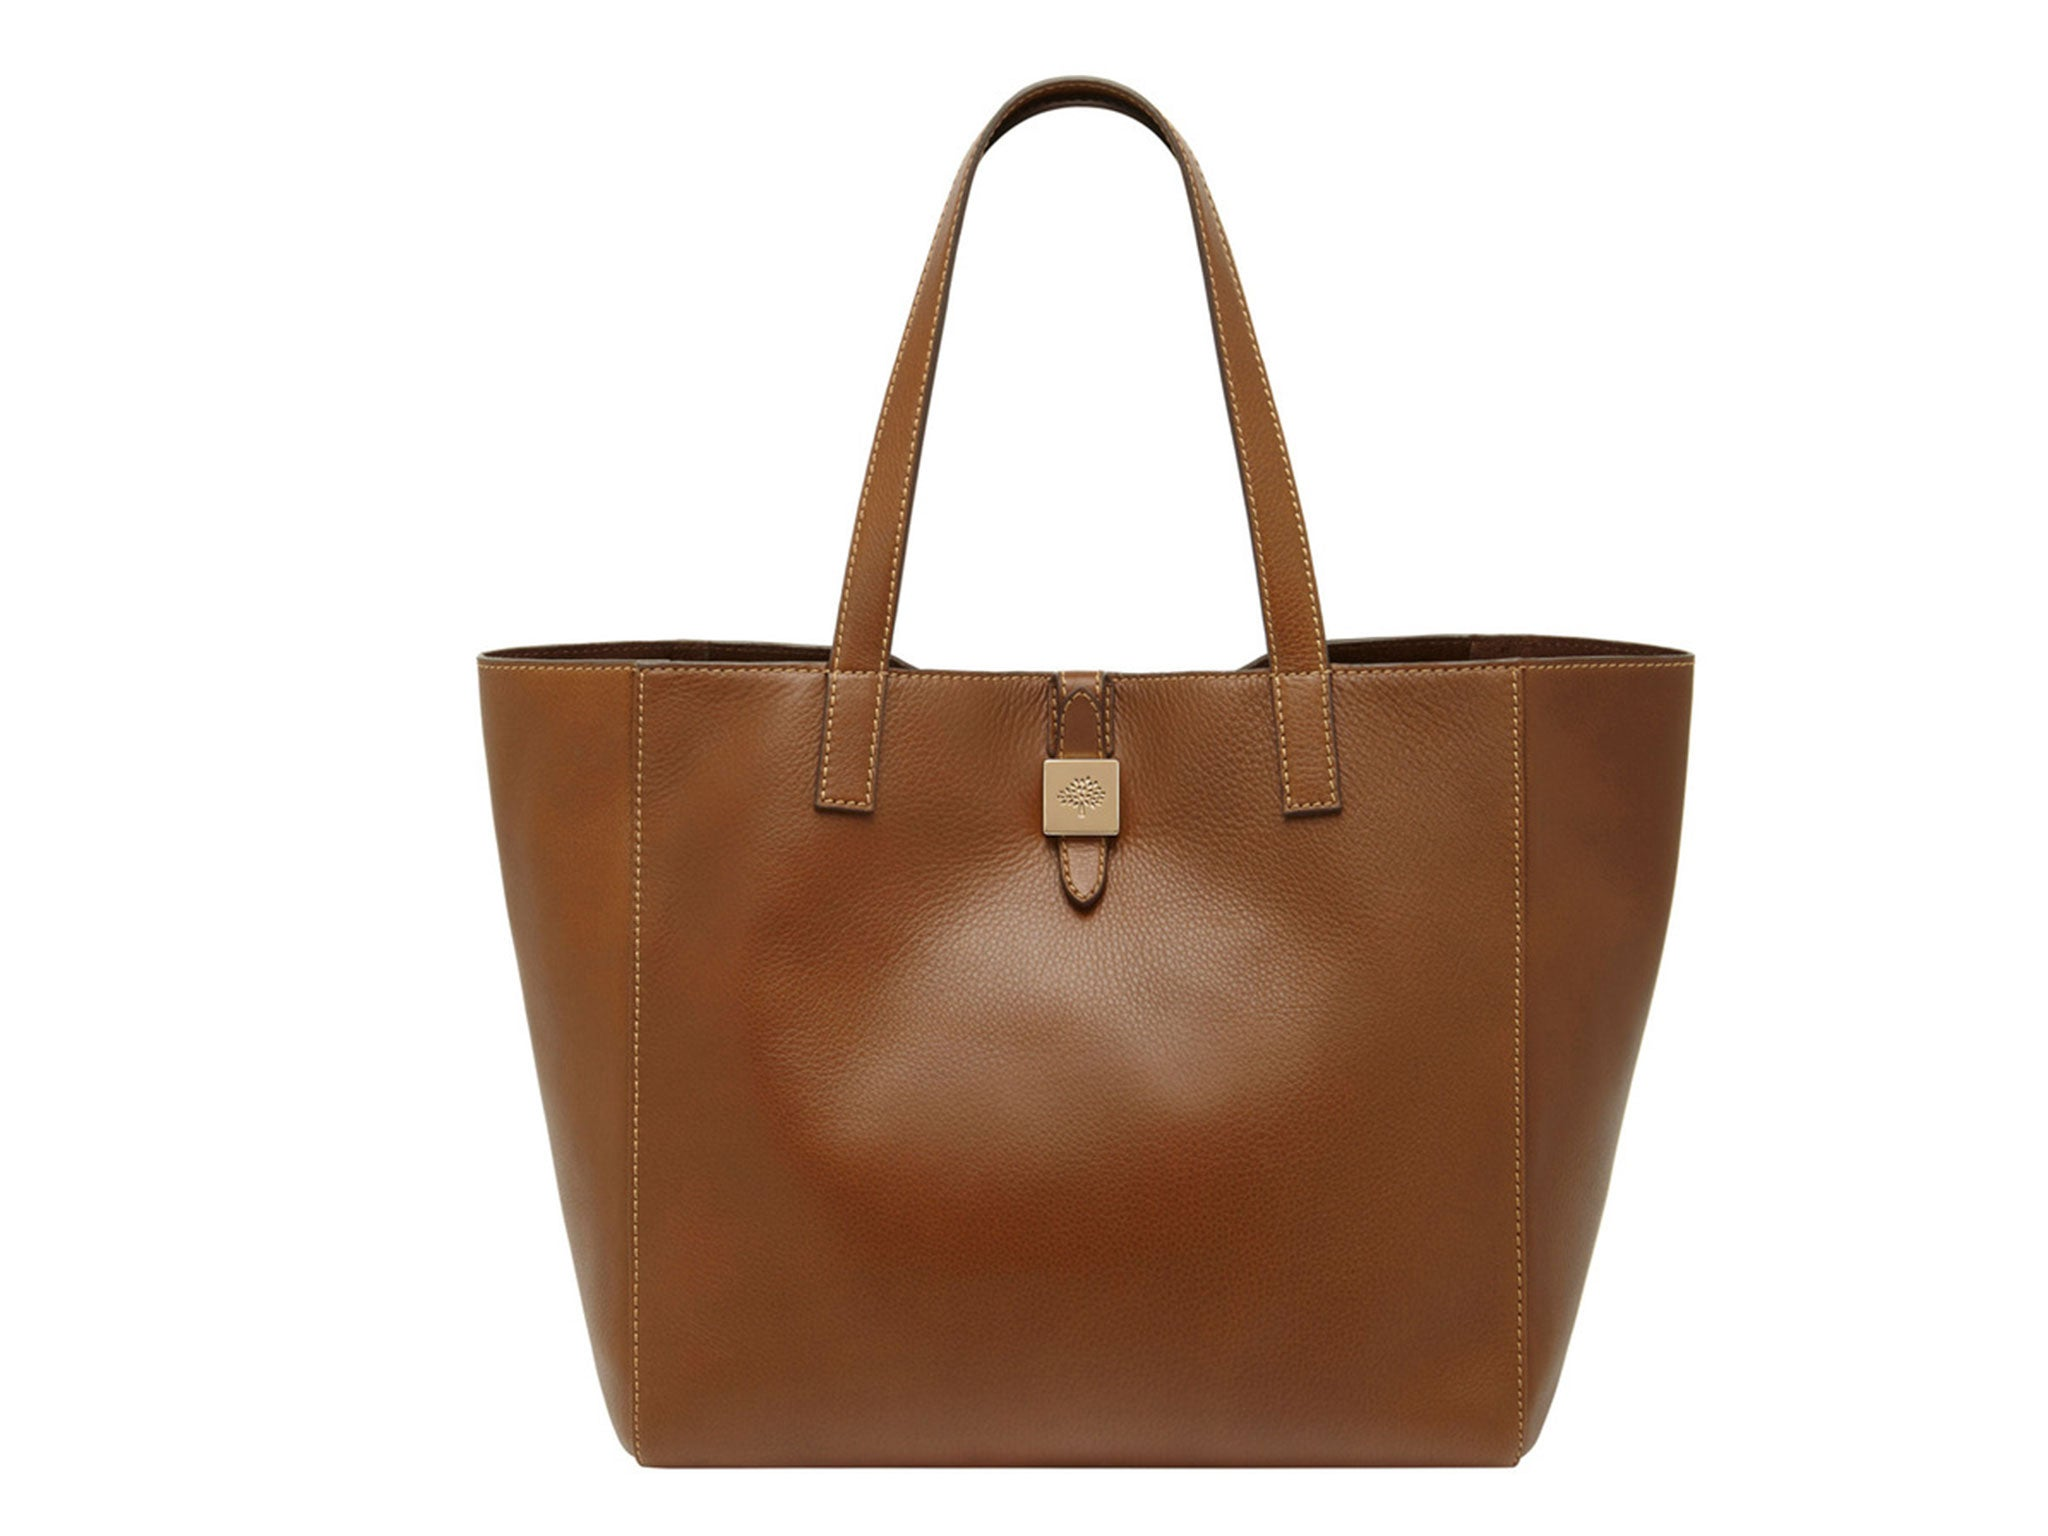 cf1e1fdfa580 8 best leather tote bags